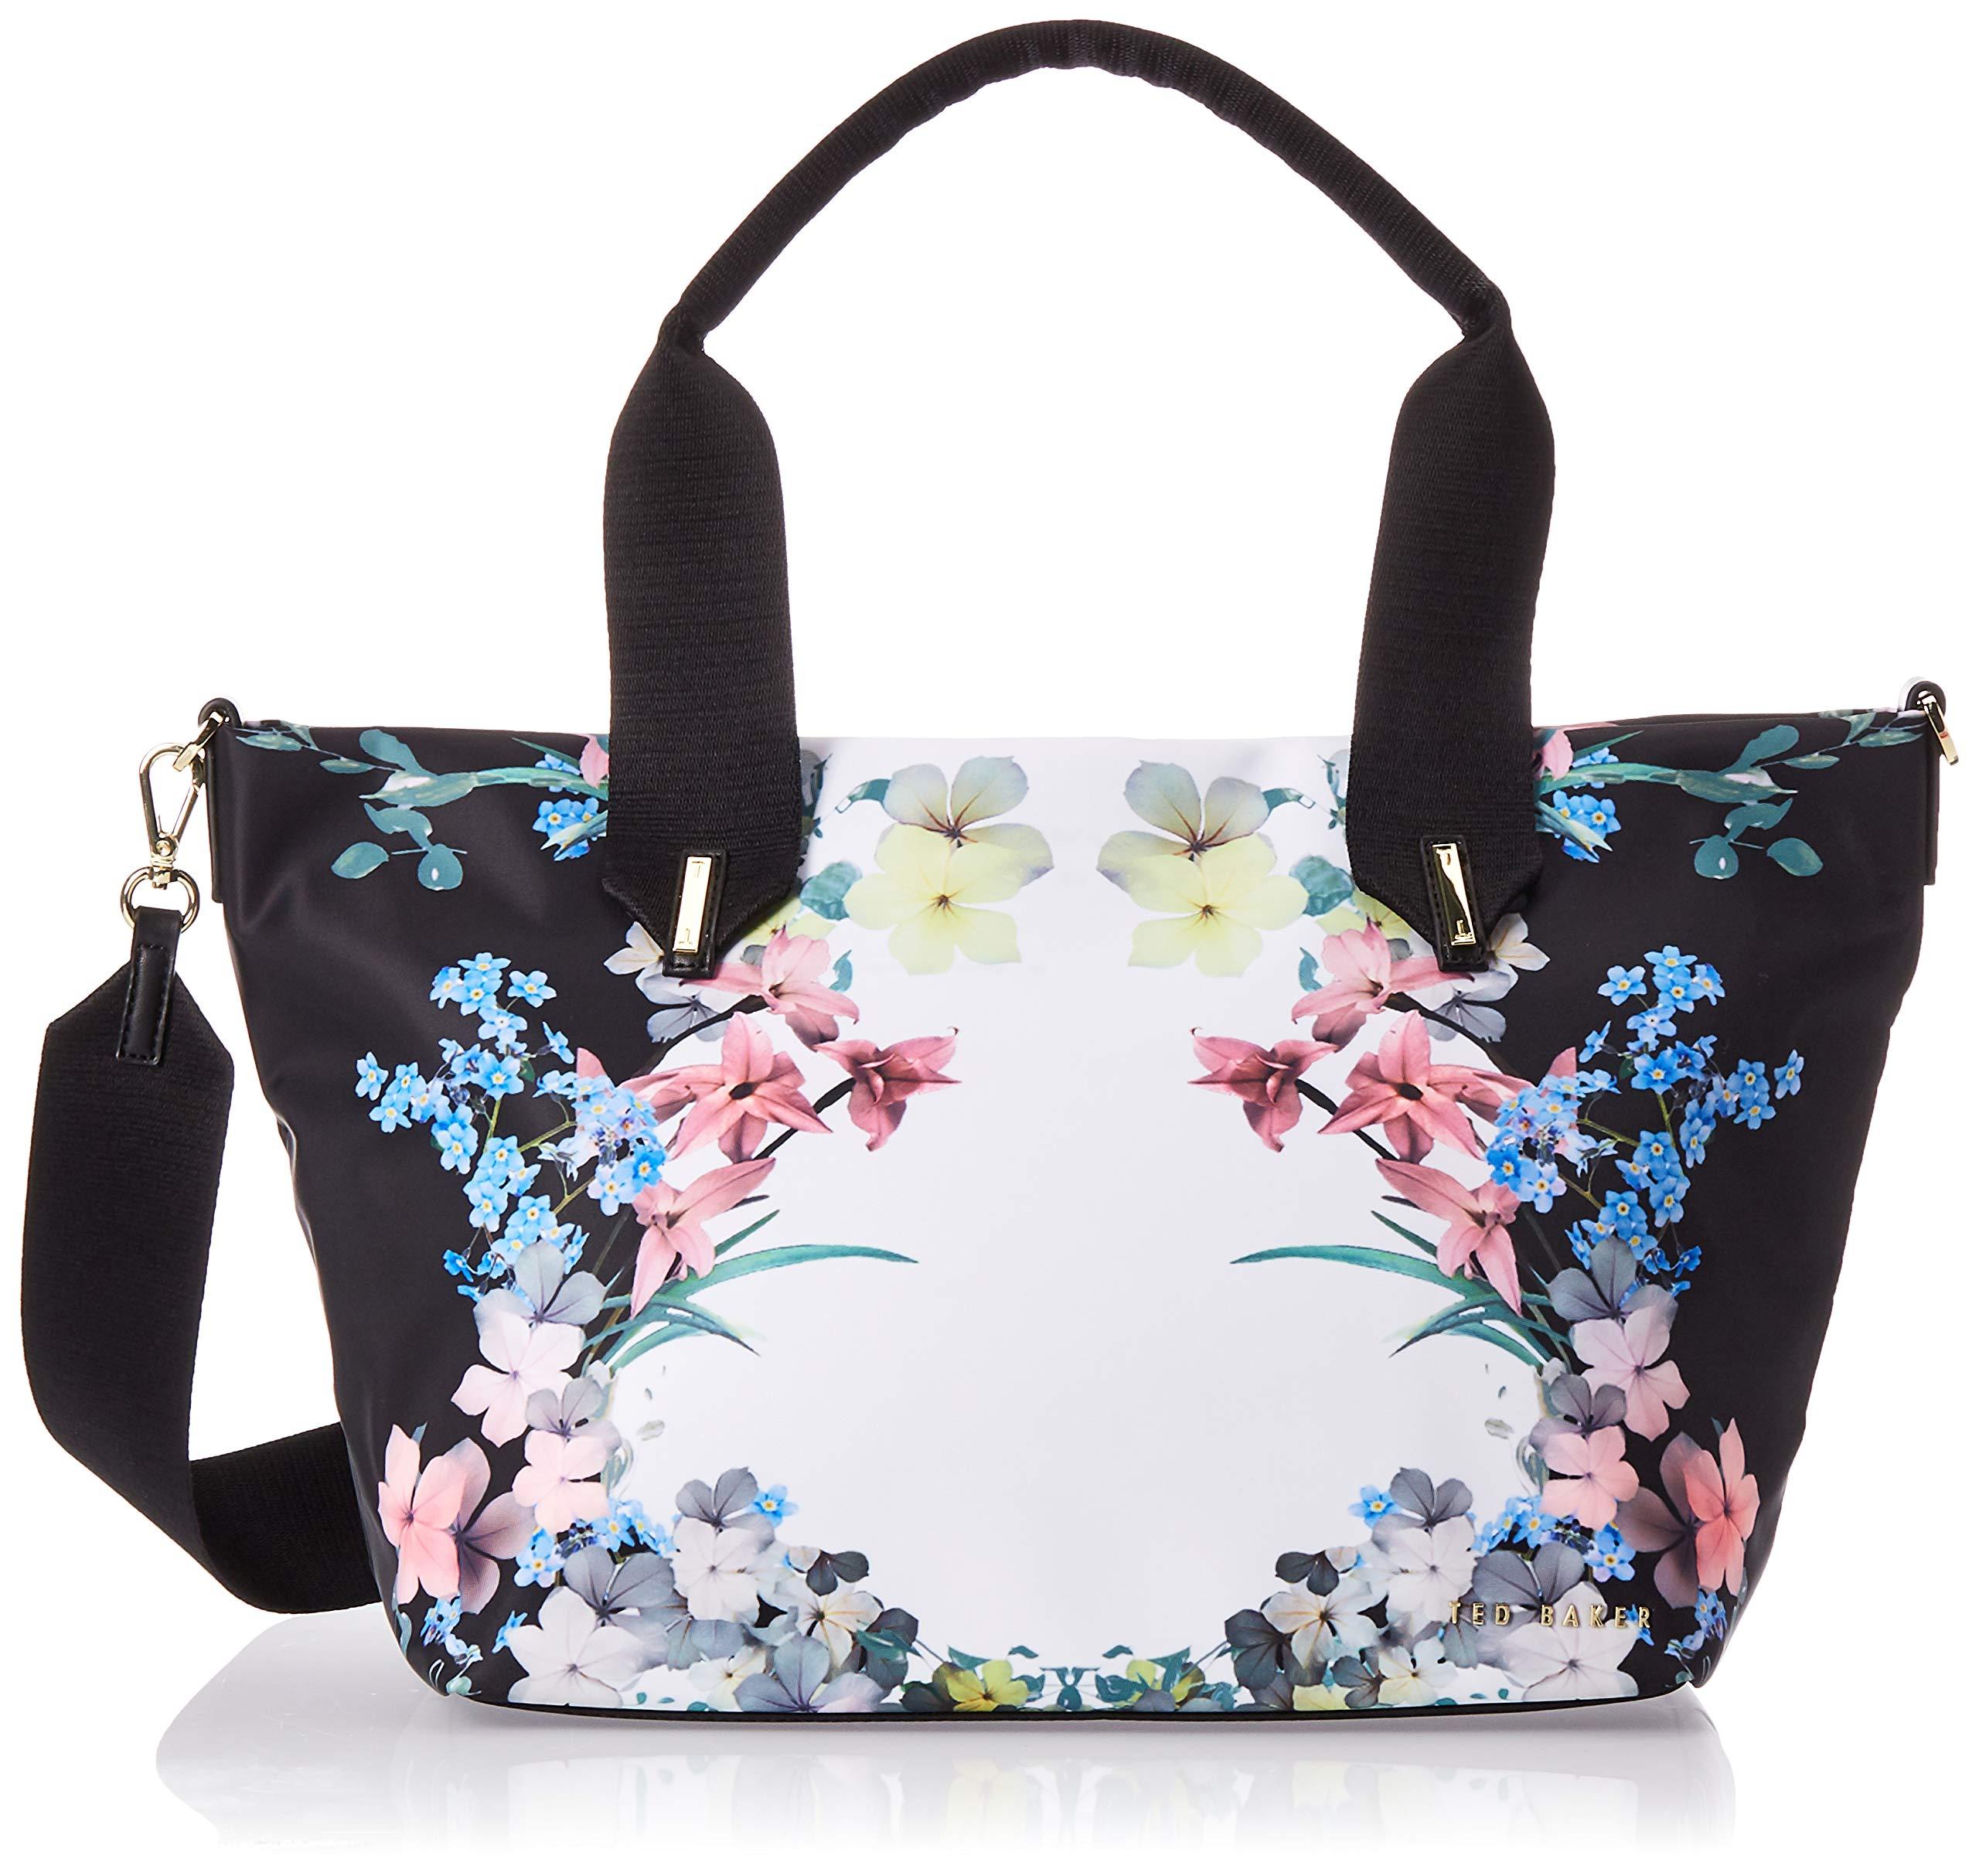 Ted Baker Daleyaa Handbag Black/White